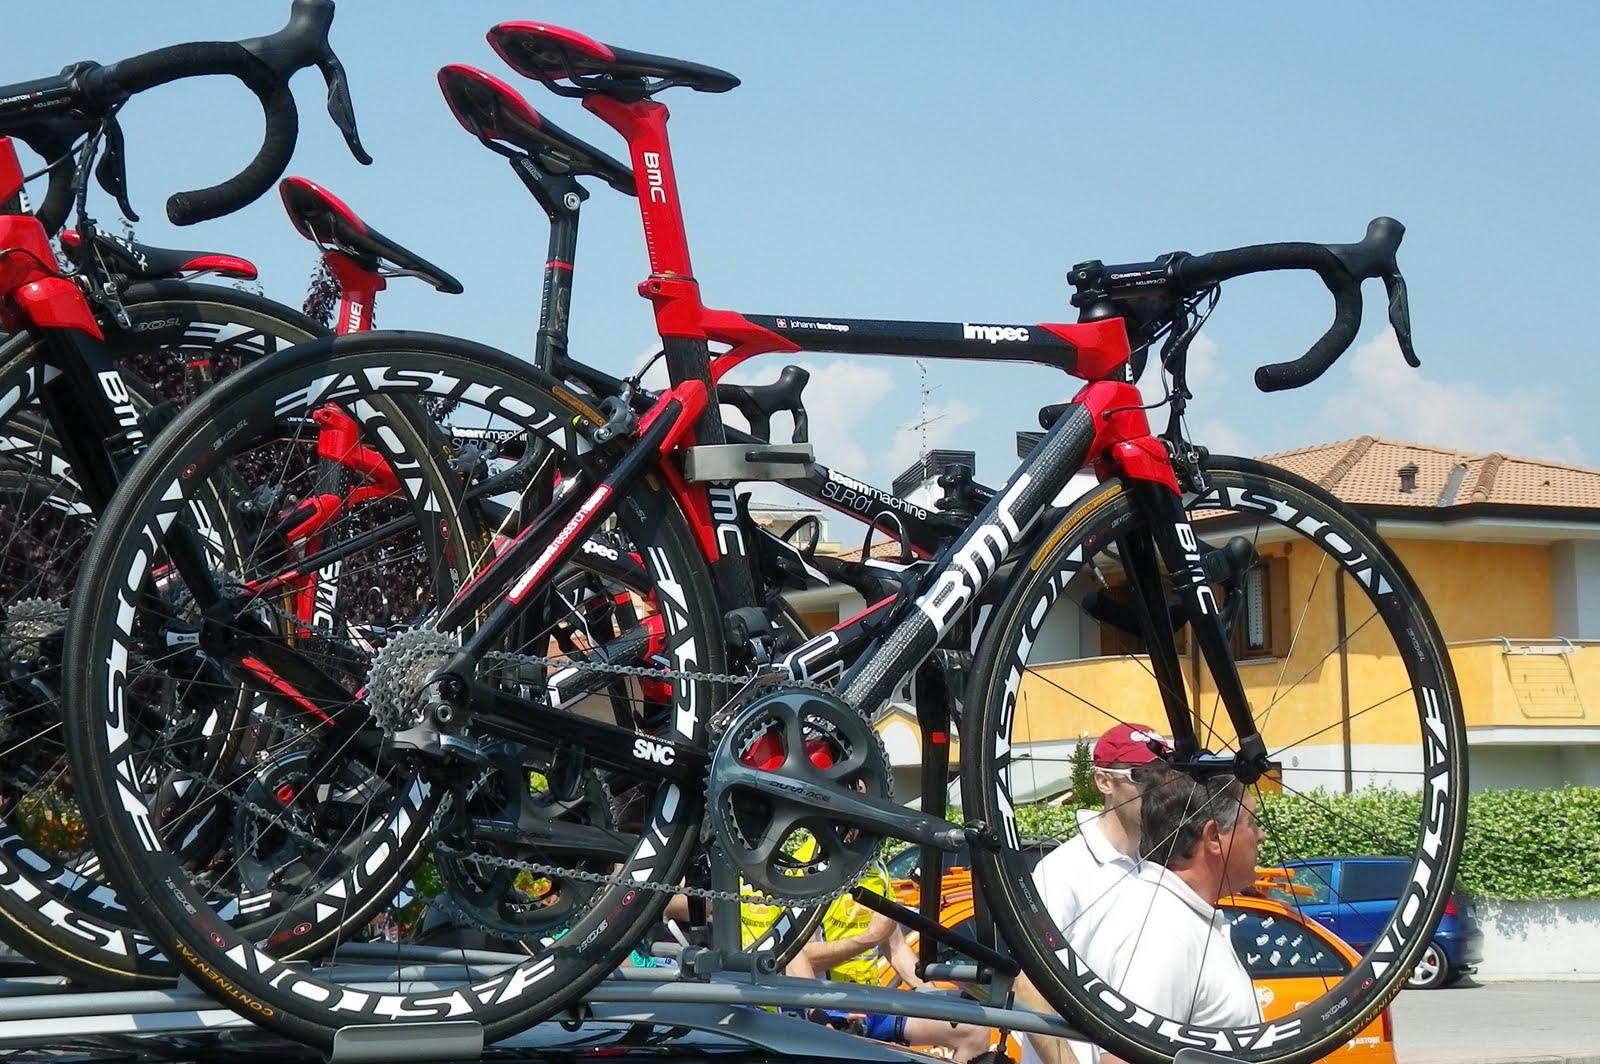 Cycling Dolomiti Friulane: Giro d'Italia in Spilimbergo